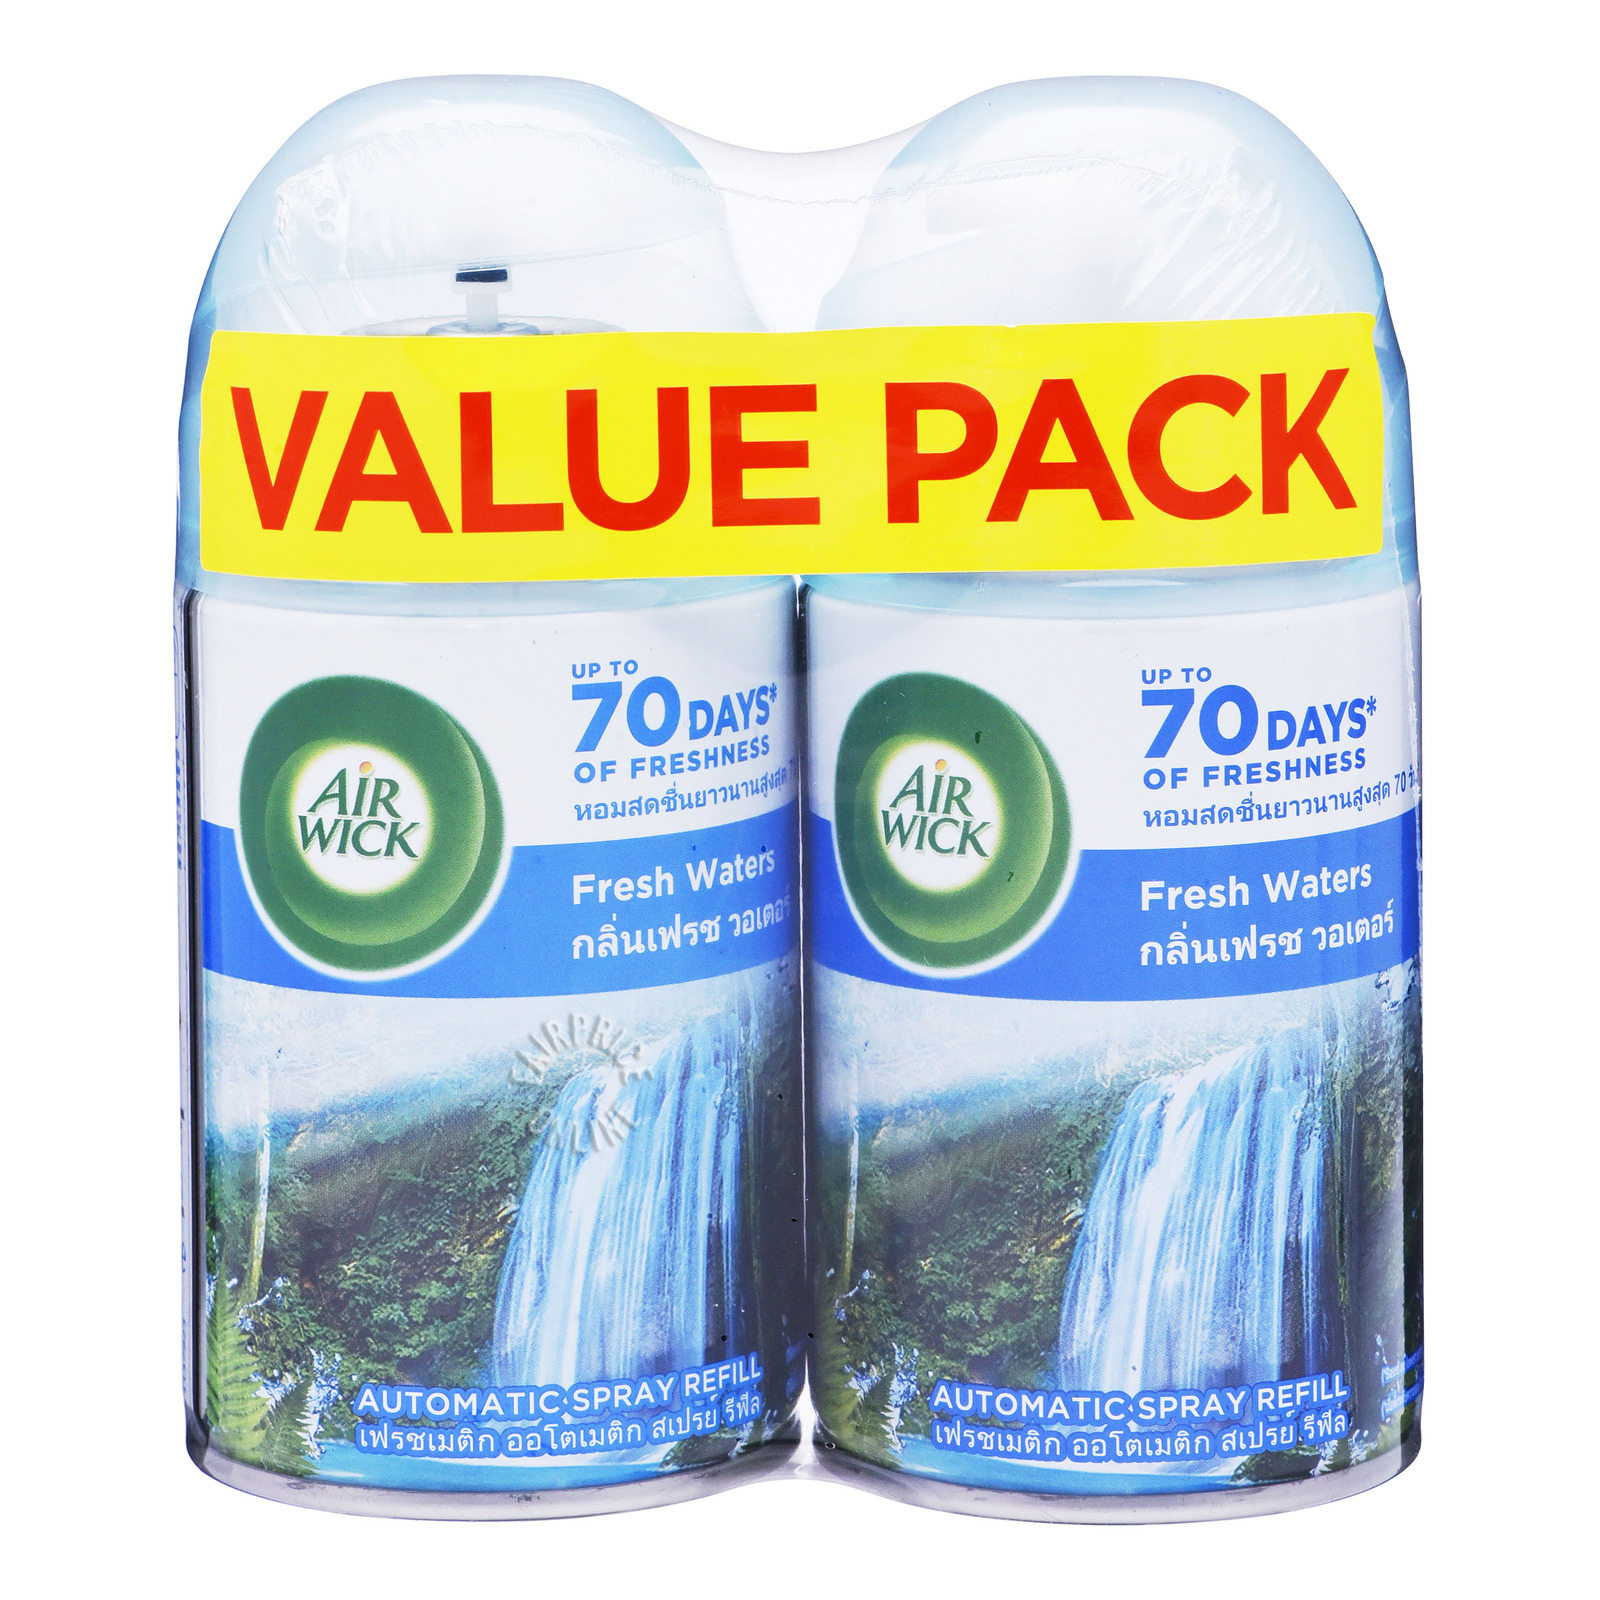 Air Wick Freshmatic Auto Spray Refill - Fresh Waters